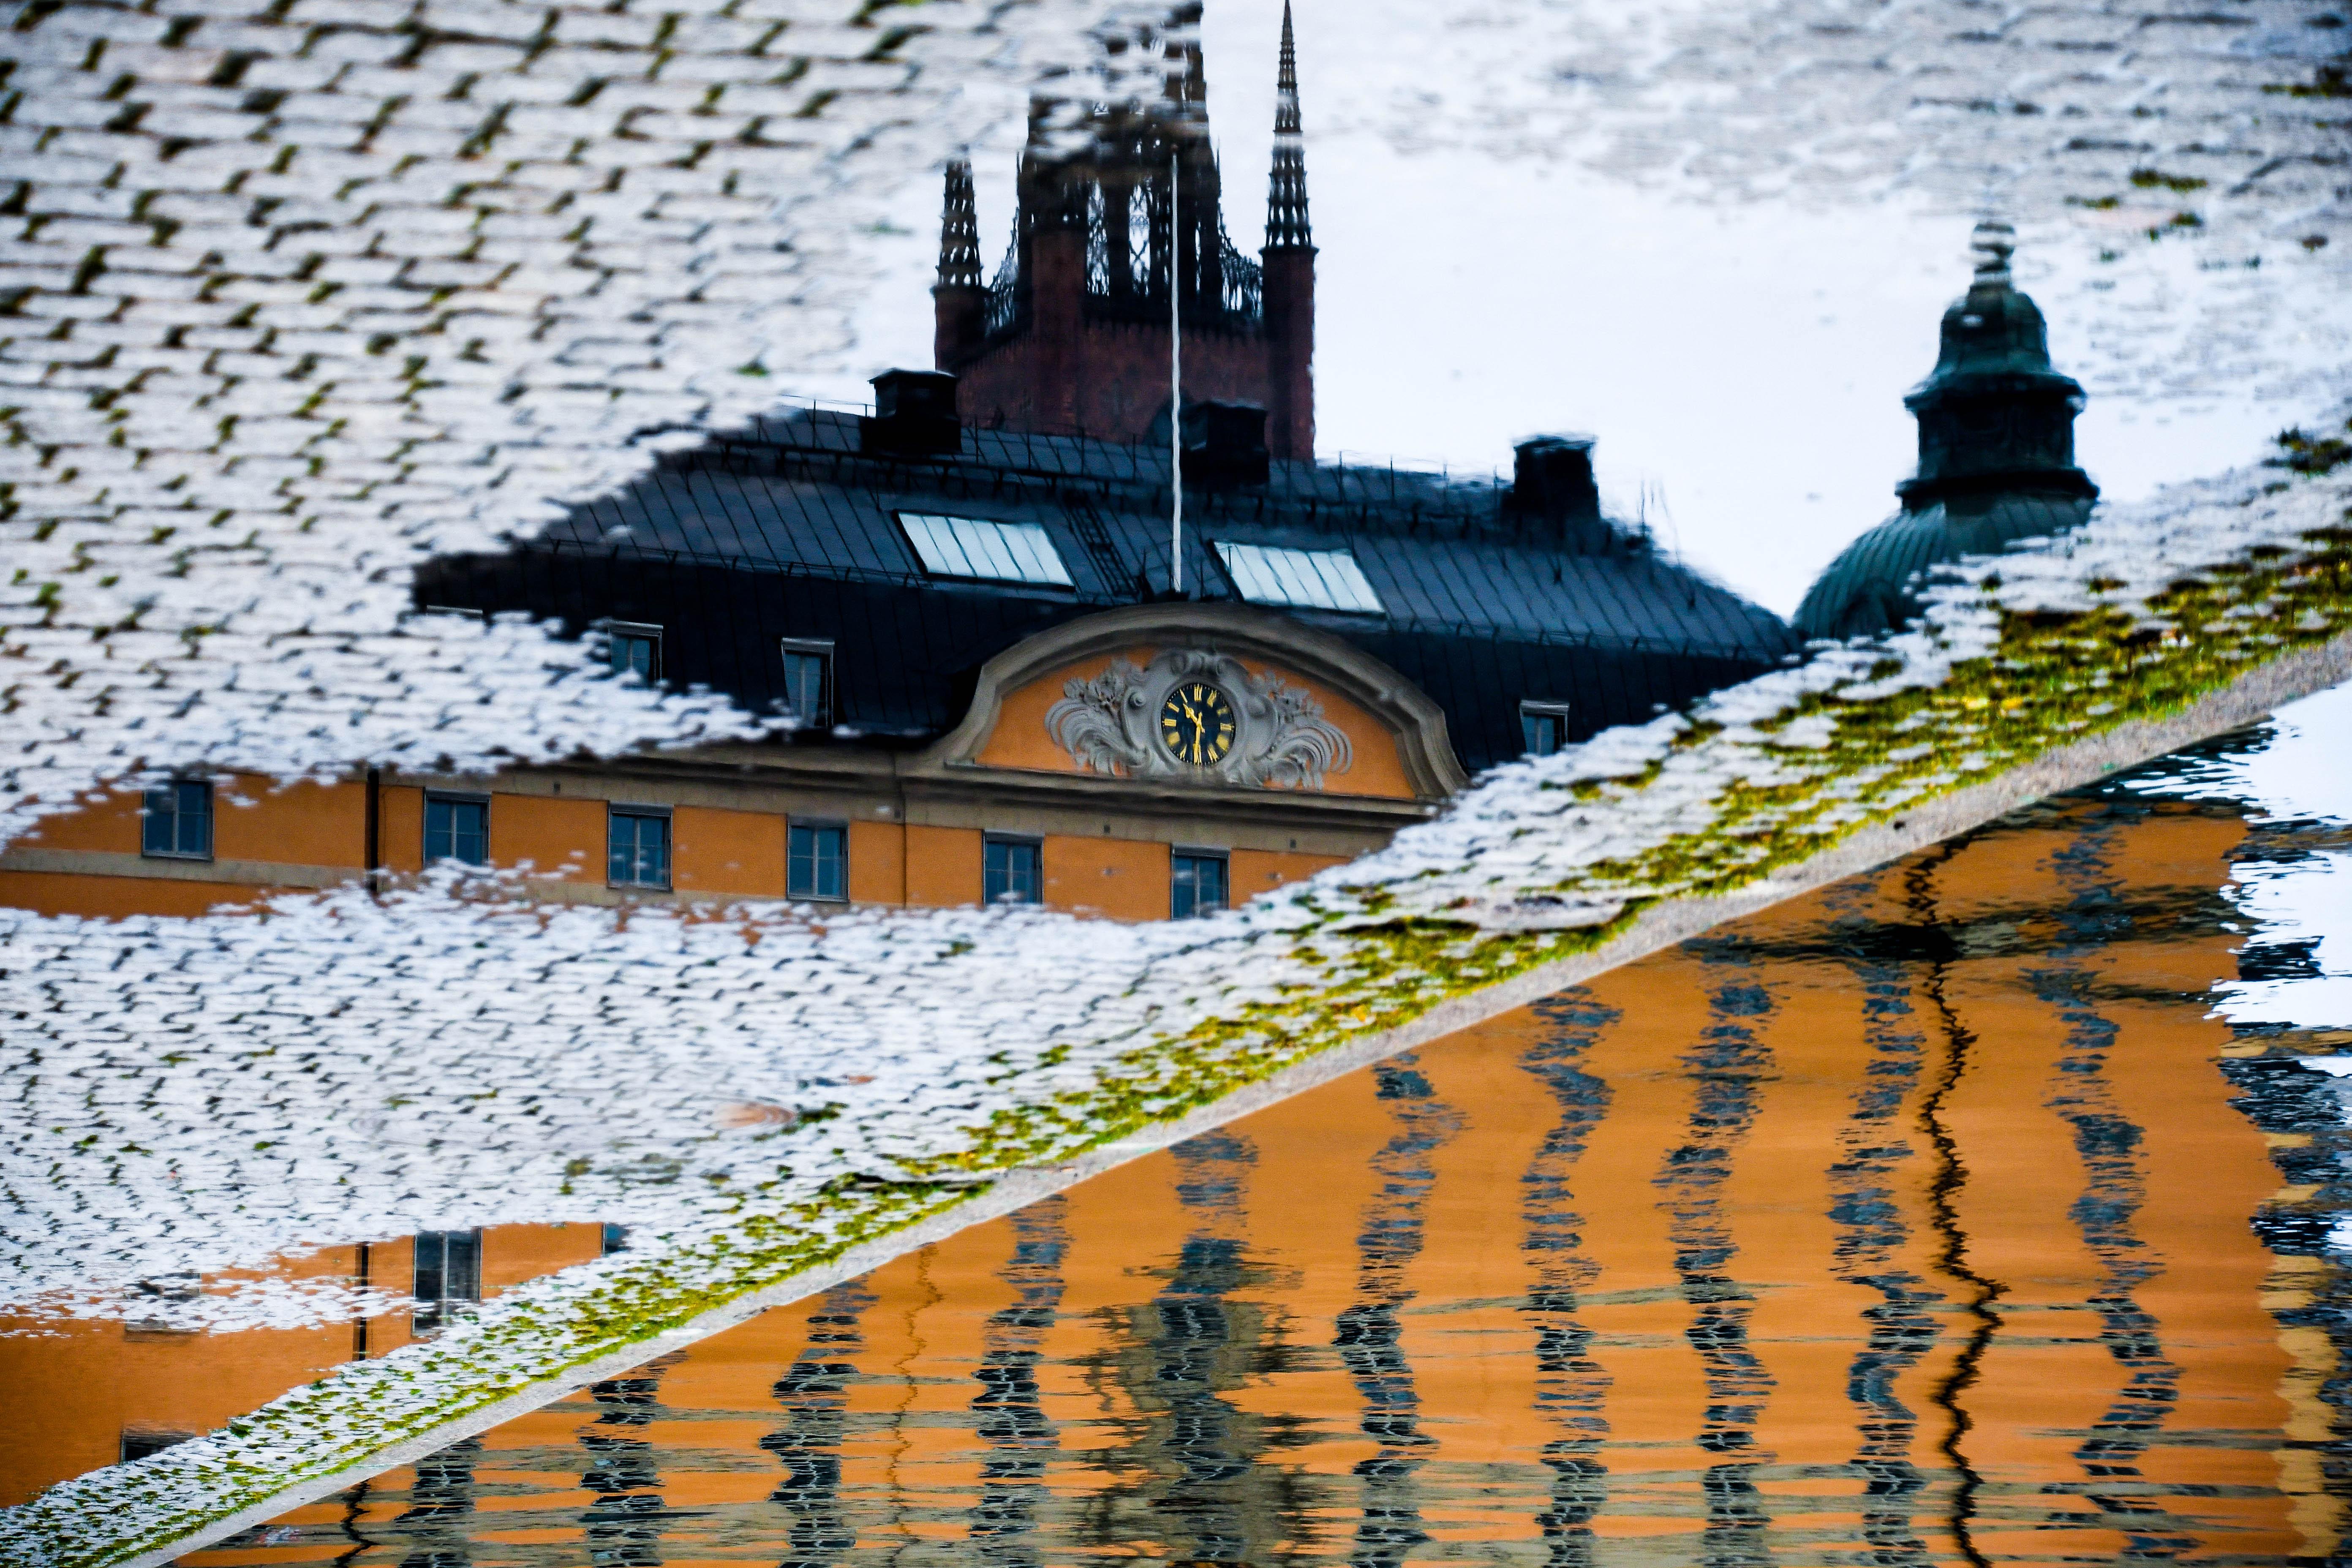 Upside Down Stockholm rainy day reflection